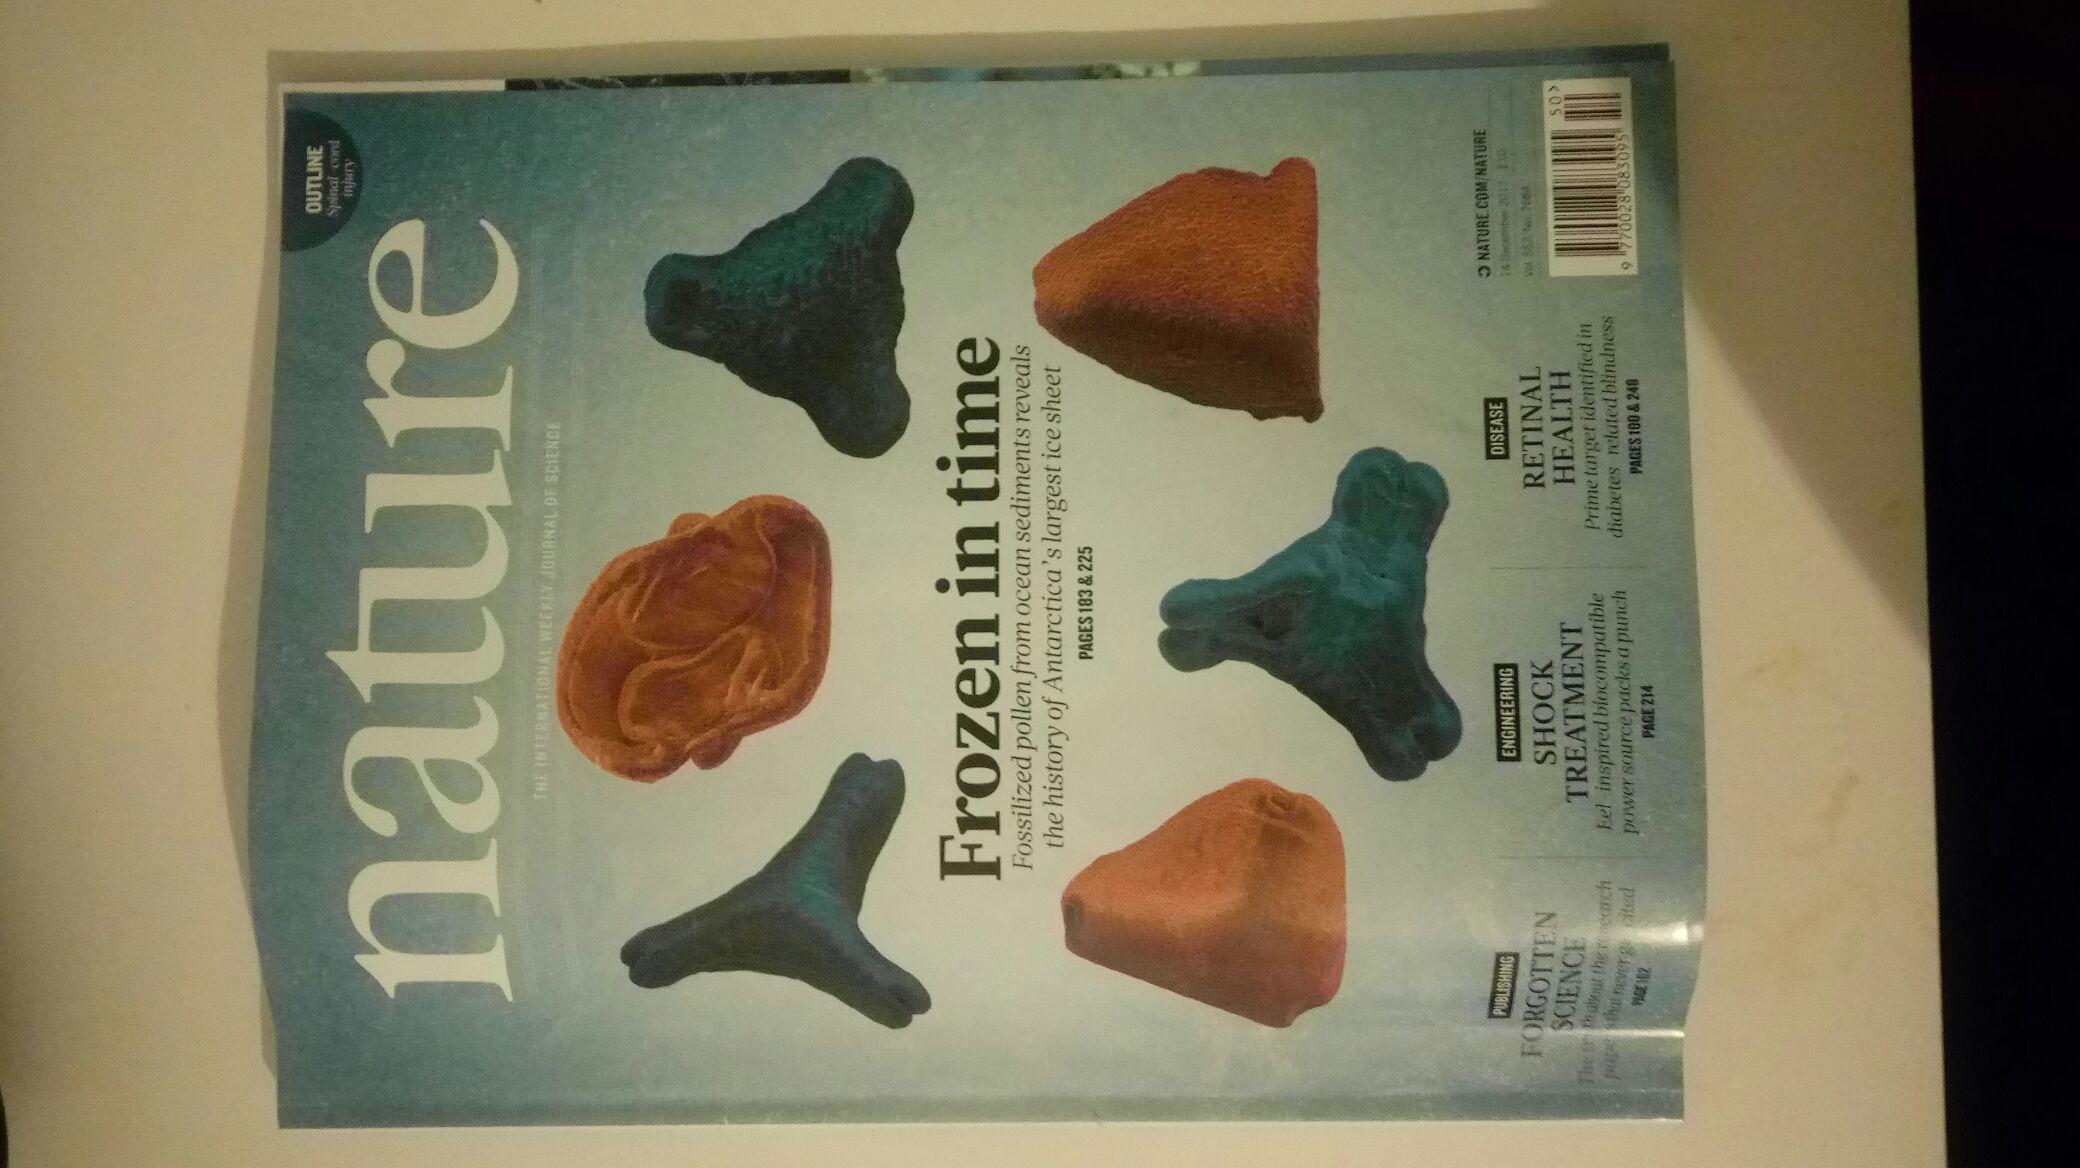 Nature Jahresabo (51 Ausgaben, Print; 1,47 € pro Heft inkl. Versand)